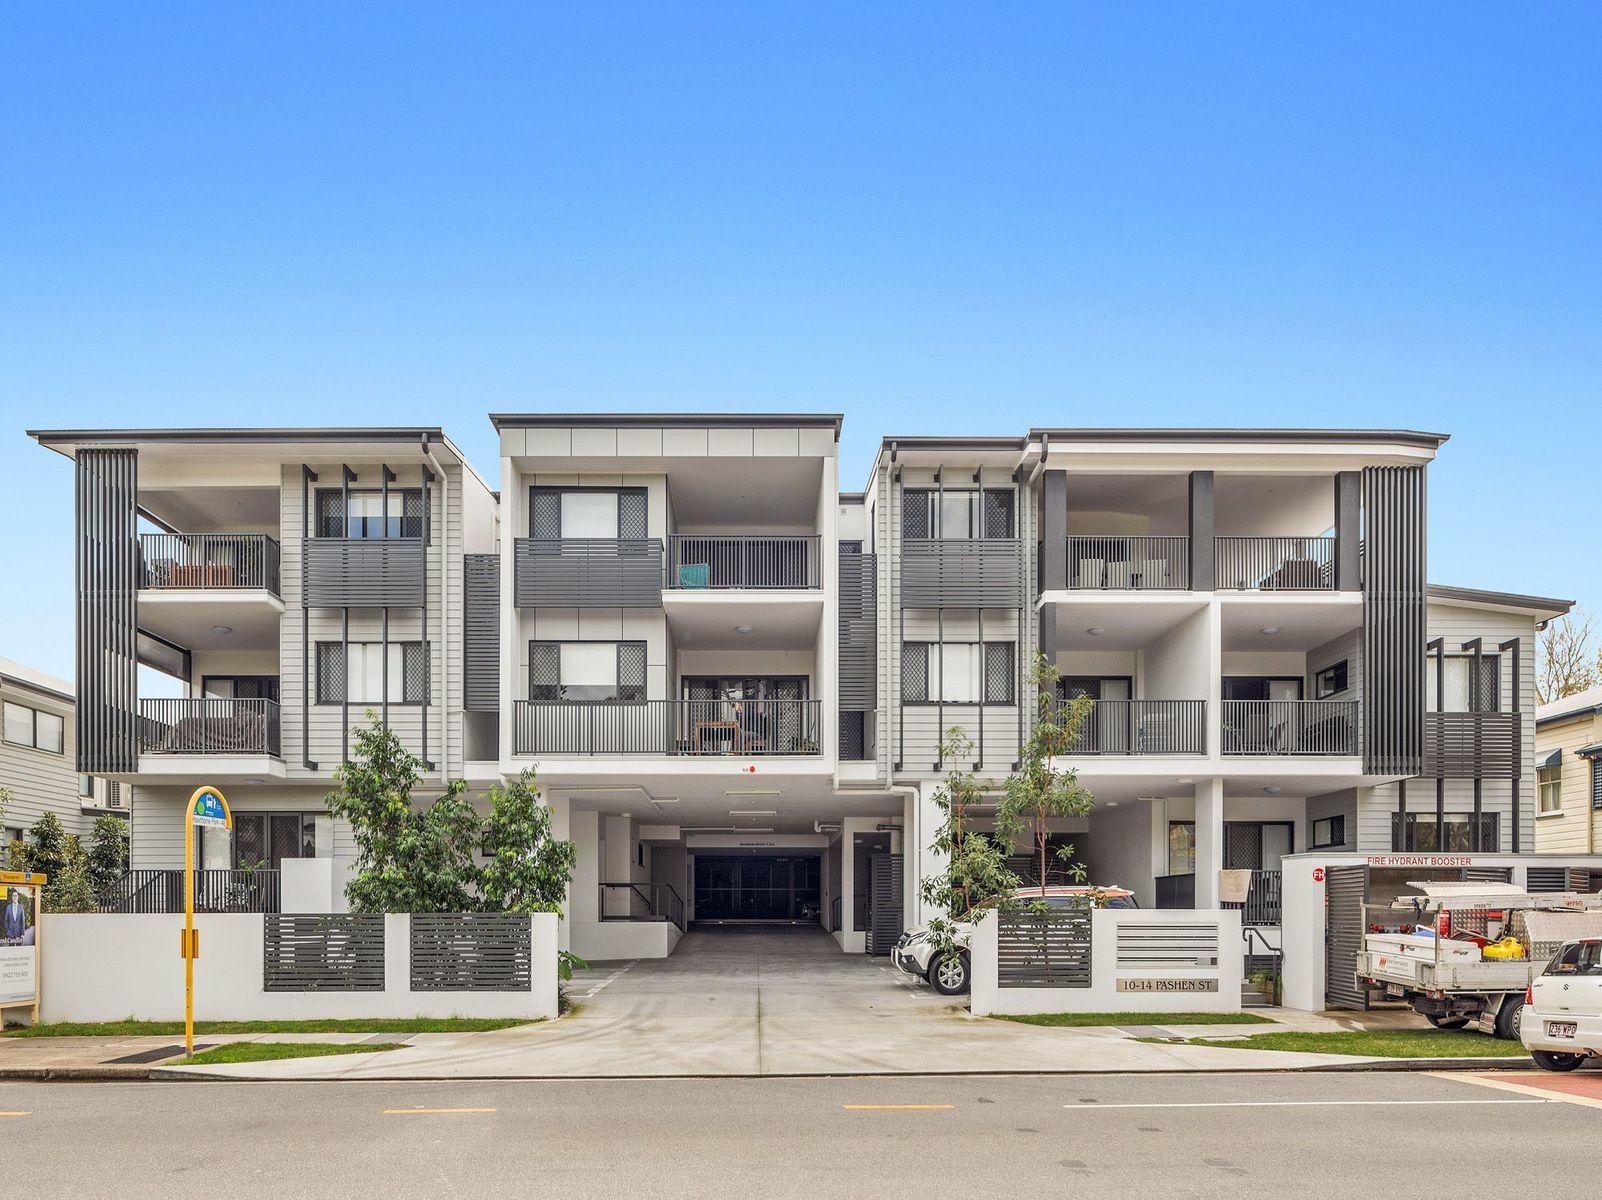 5/14 Pashen Street, Morningside, QLD 4171